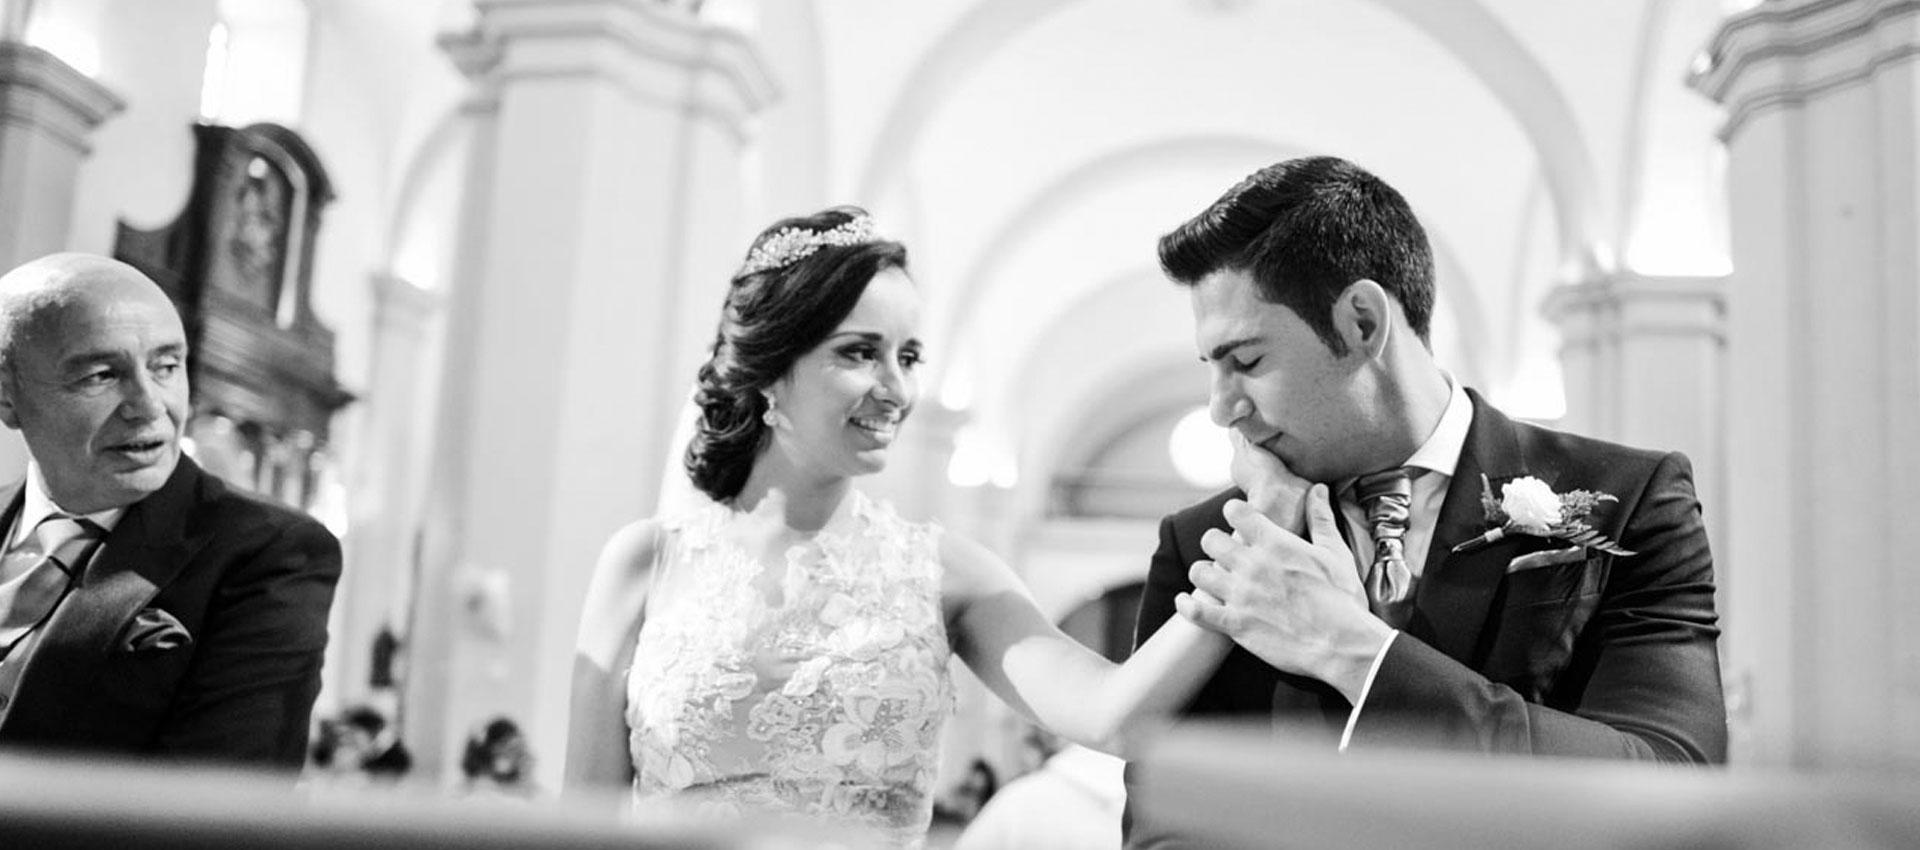 SONIA-Y-DANI2 Back to the Wedding - video boda cadiz